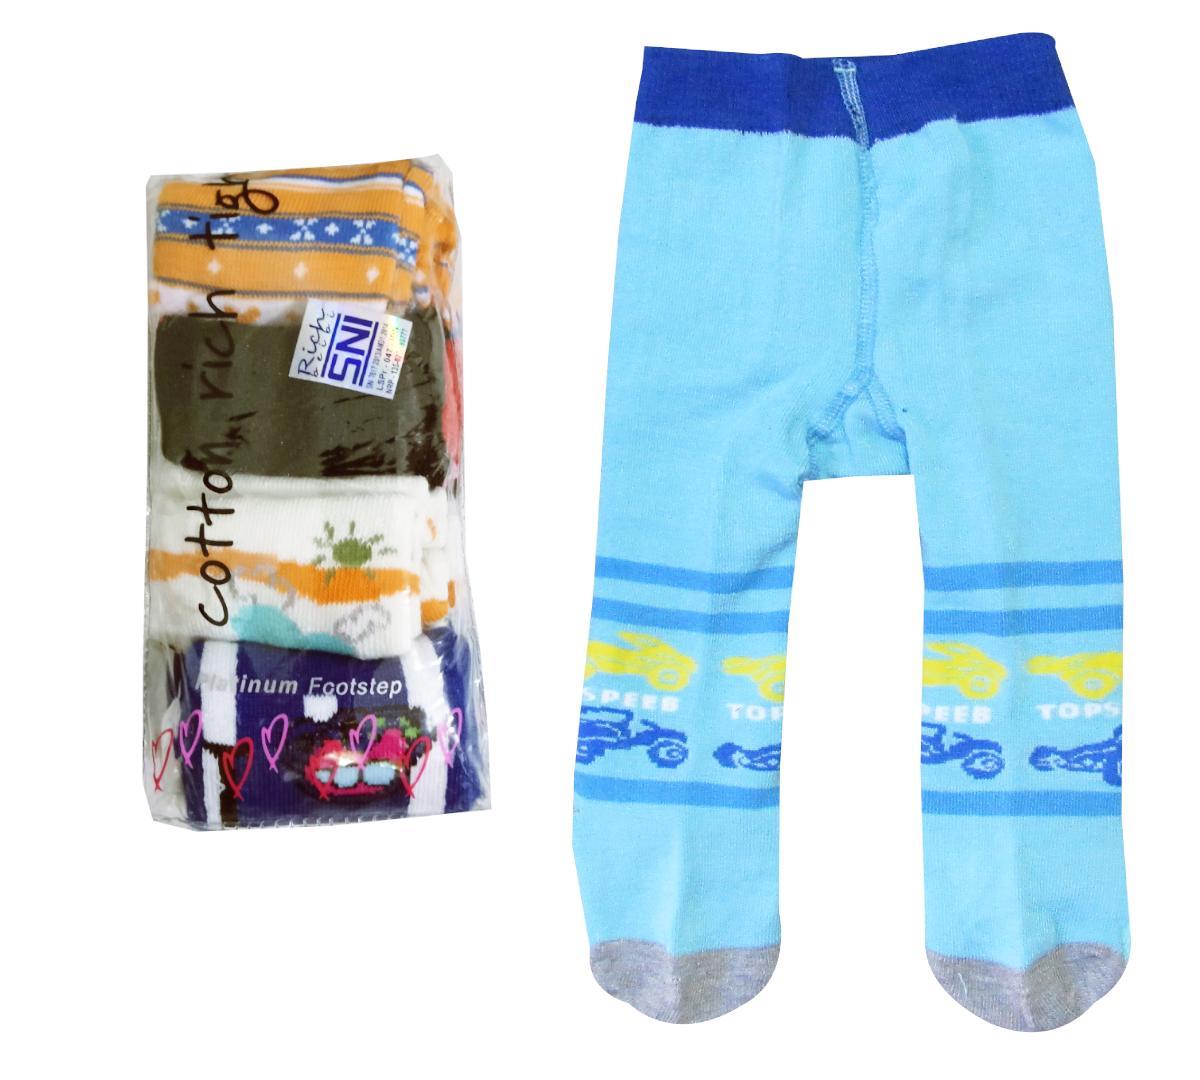 Celana Panjang 4 Pcs Legging Panjang Anak Bayi Tutup Kaki Untuk Laki Laki Dan Perempuan Catton Rich Carters Lazada Indonesia